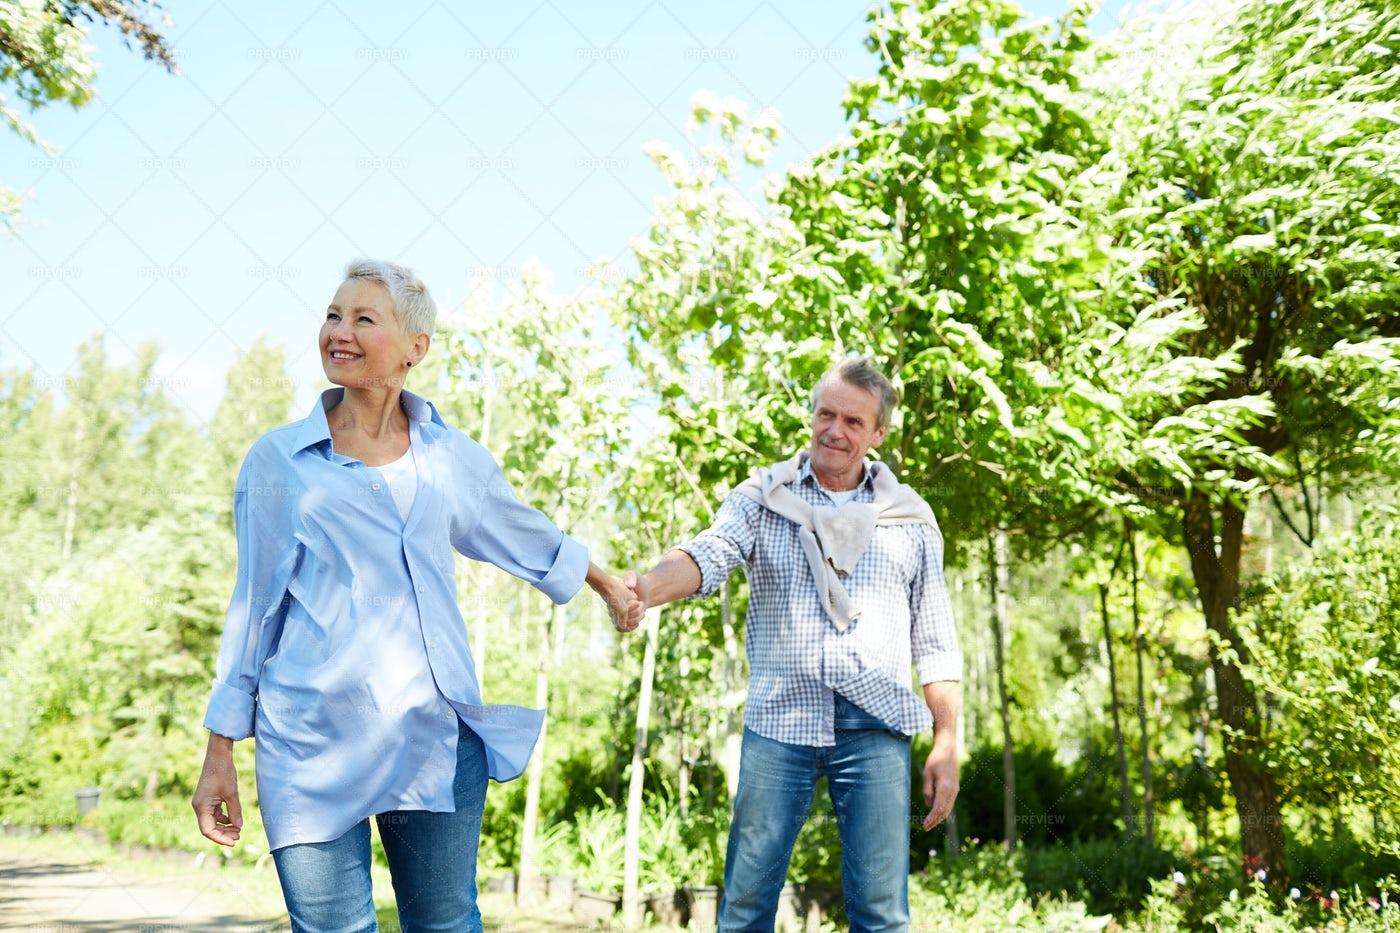 Senior Woman Leading Husband In...: Stock Photos